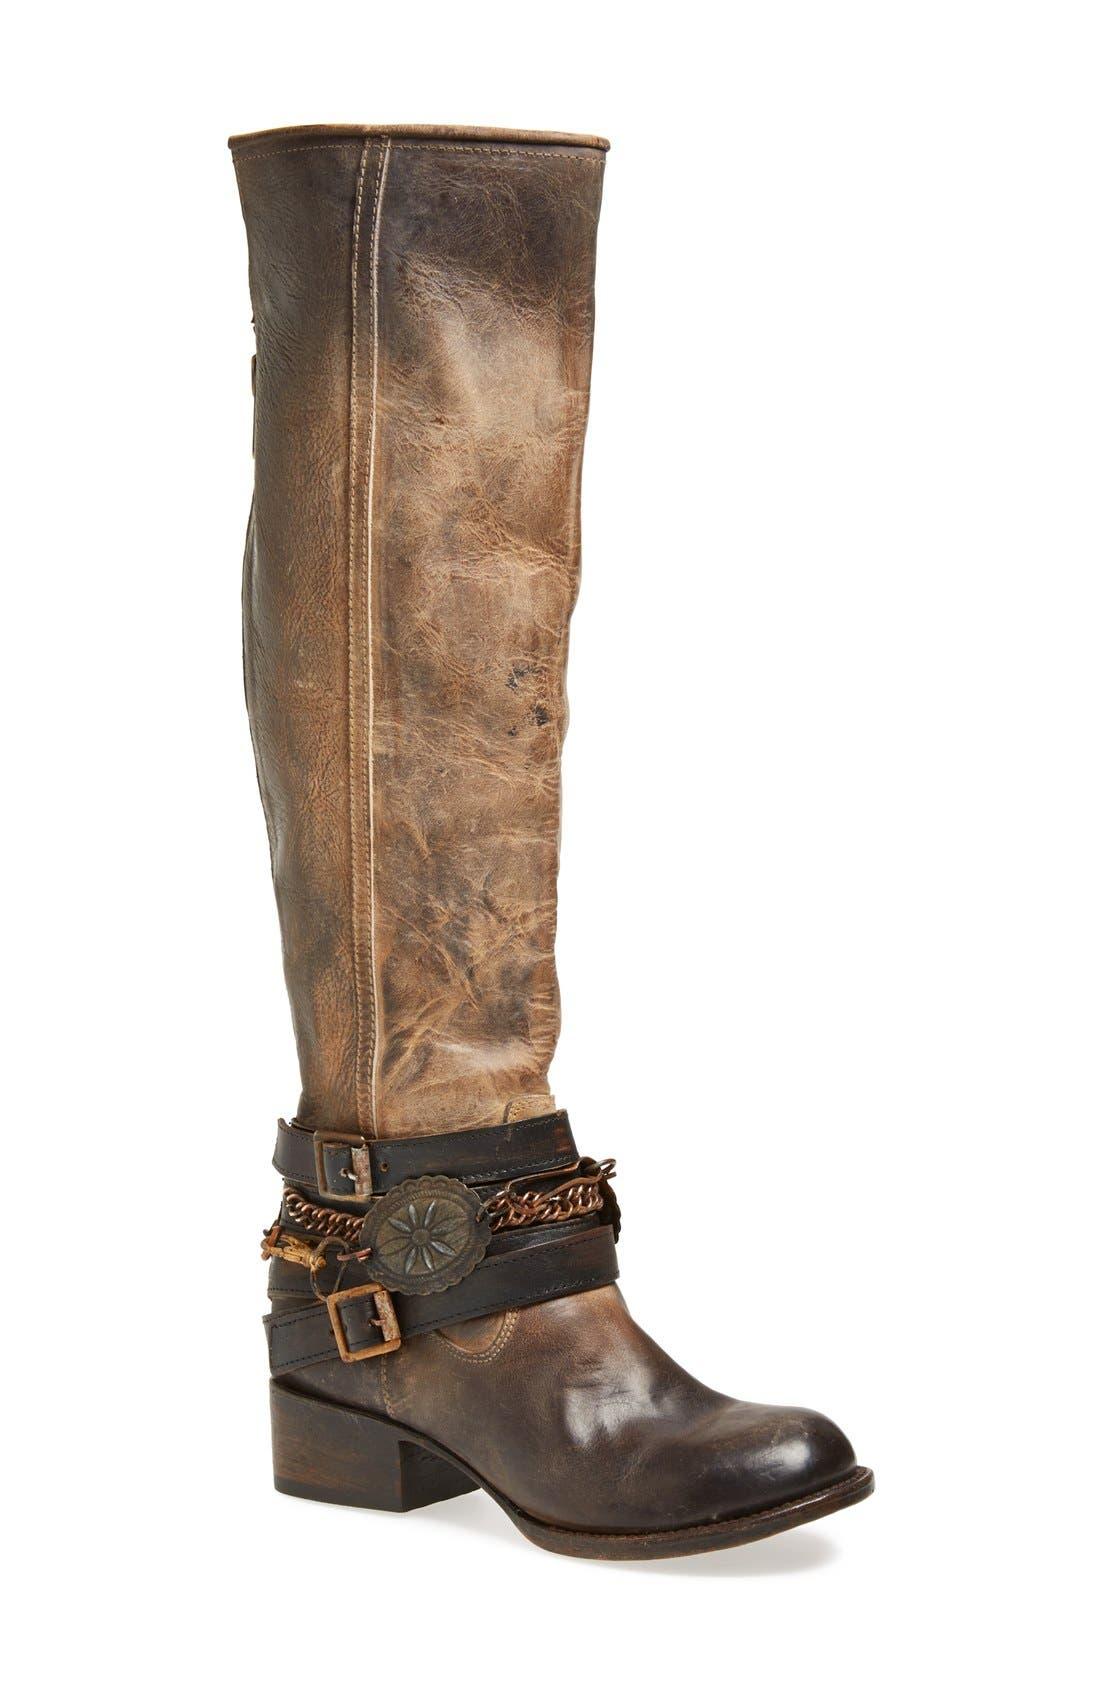 Alternate Image 1 Selected - Freebird by Steven Western Leather Boot (Women)